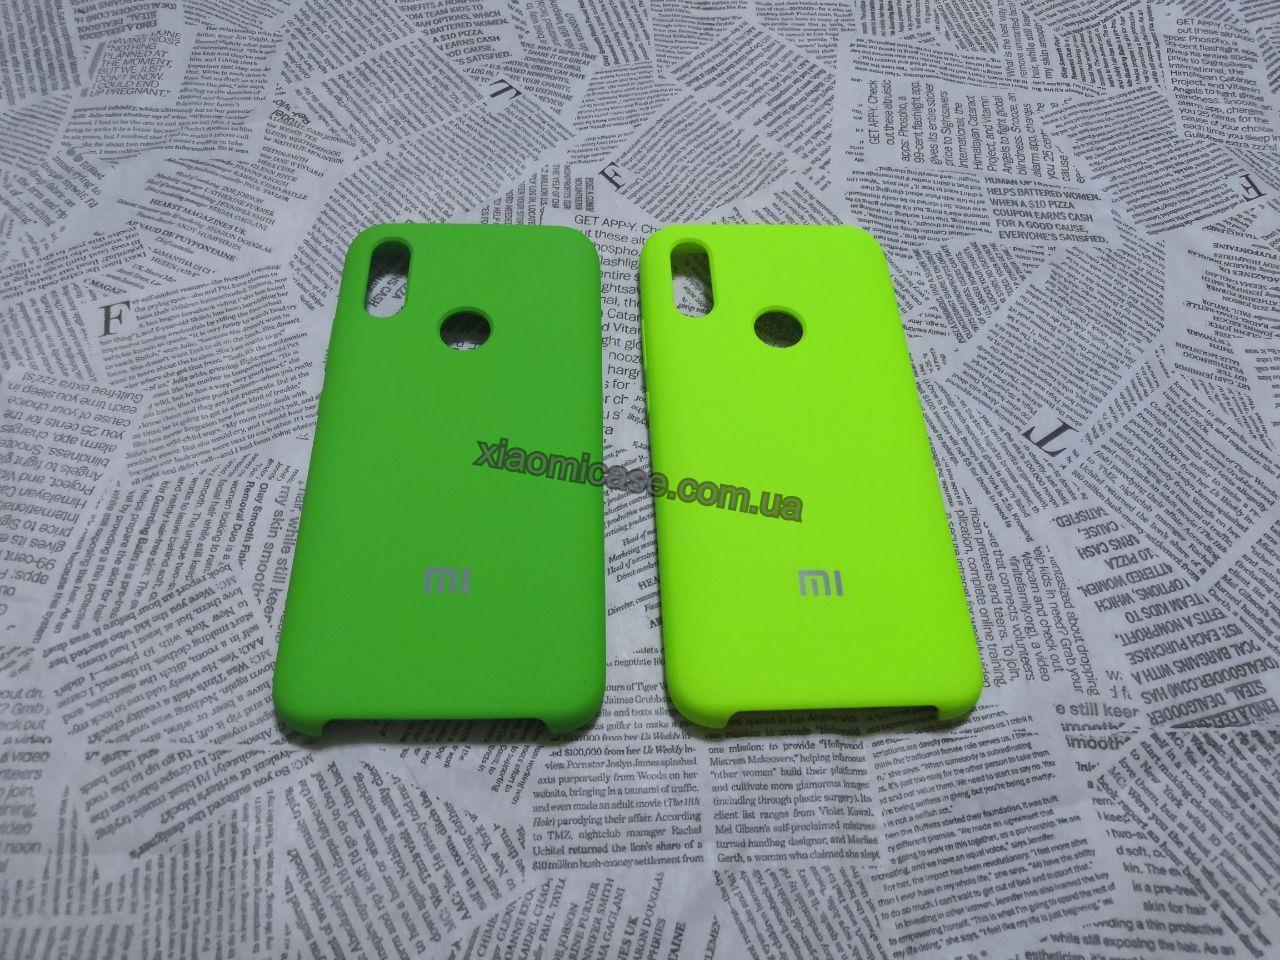 Брендовый Soft-touch чехолSilicone Cover для Xiaomi (Ксиоми) Redmi 7 (Зеленый и Лайм)